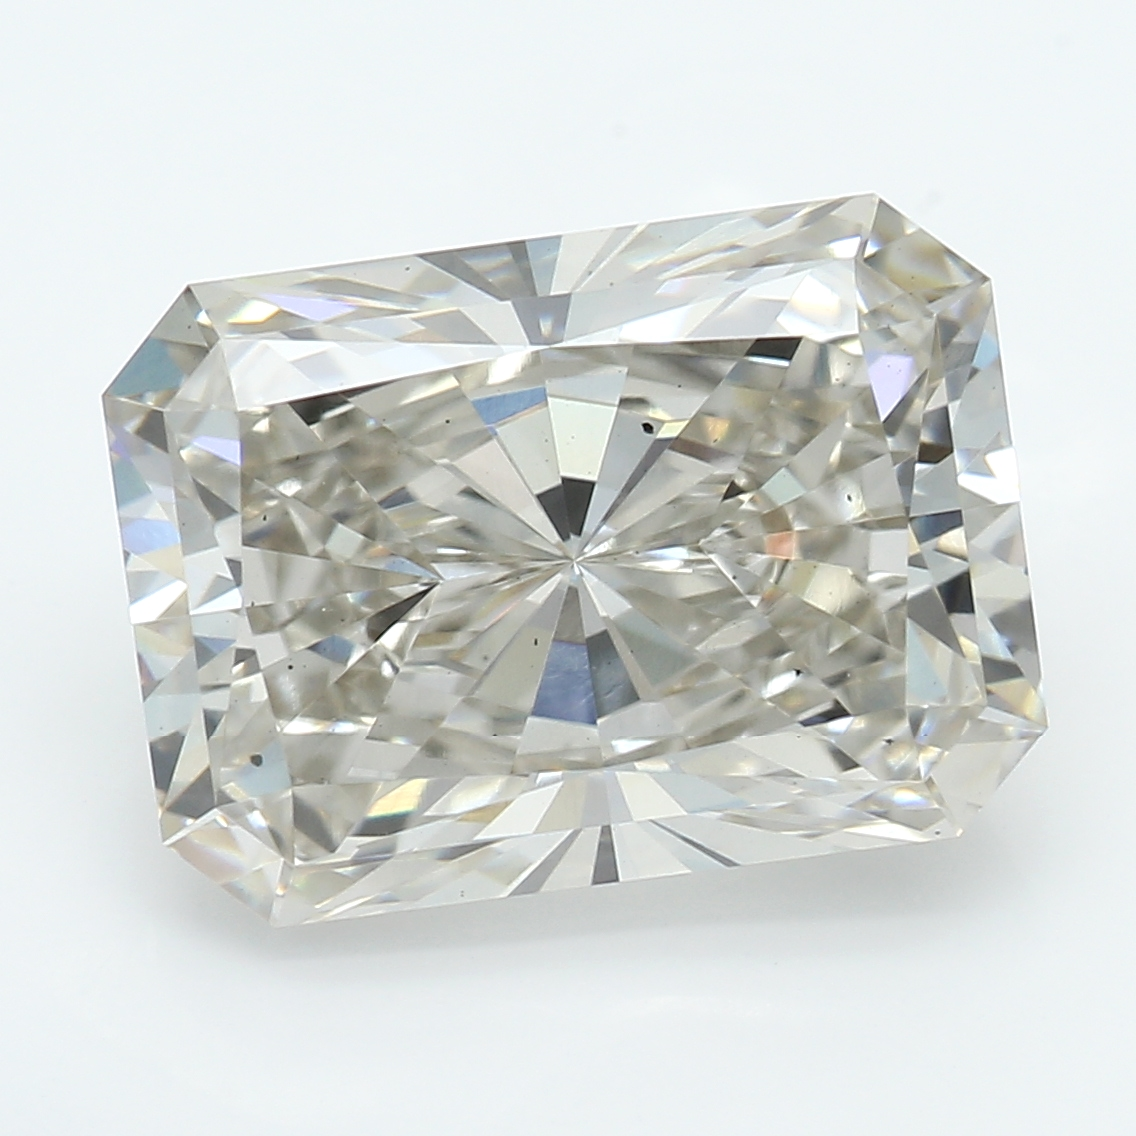 3.05 Carat J-SI1 Ideal Radiant Diamond